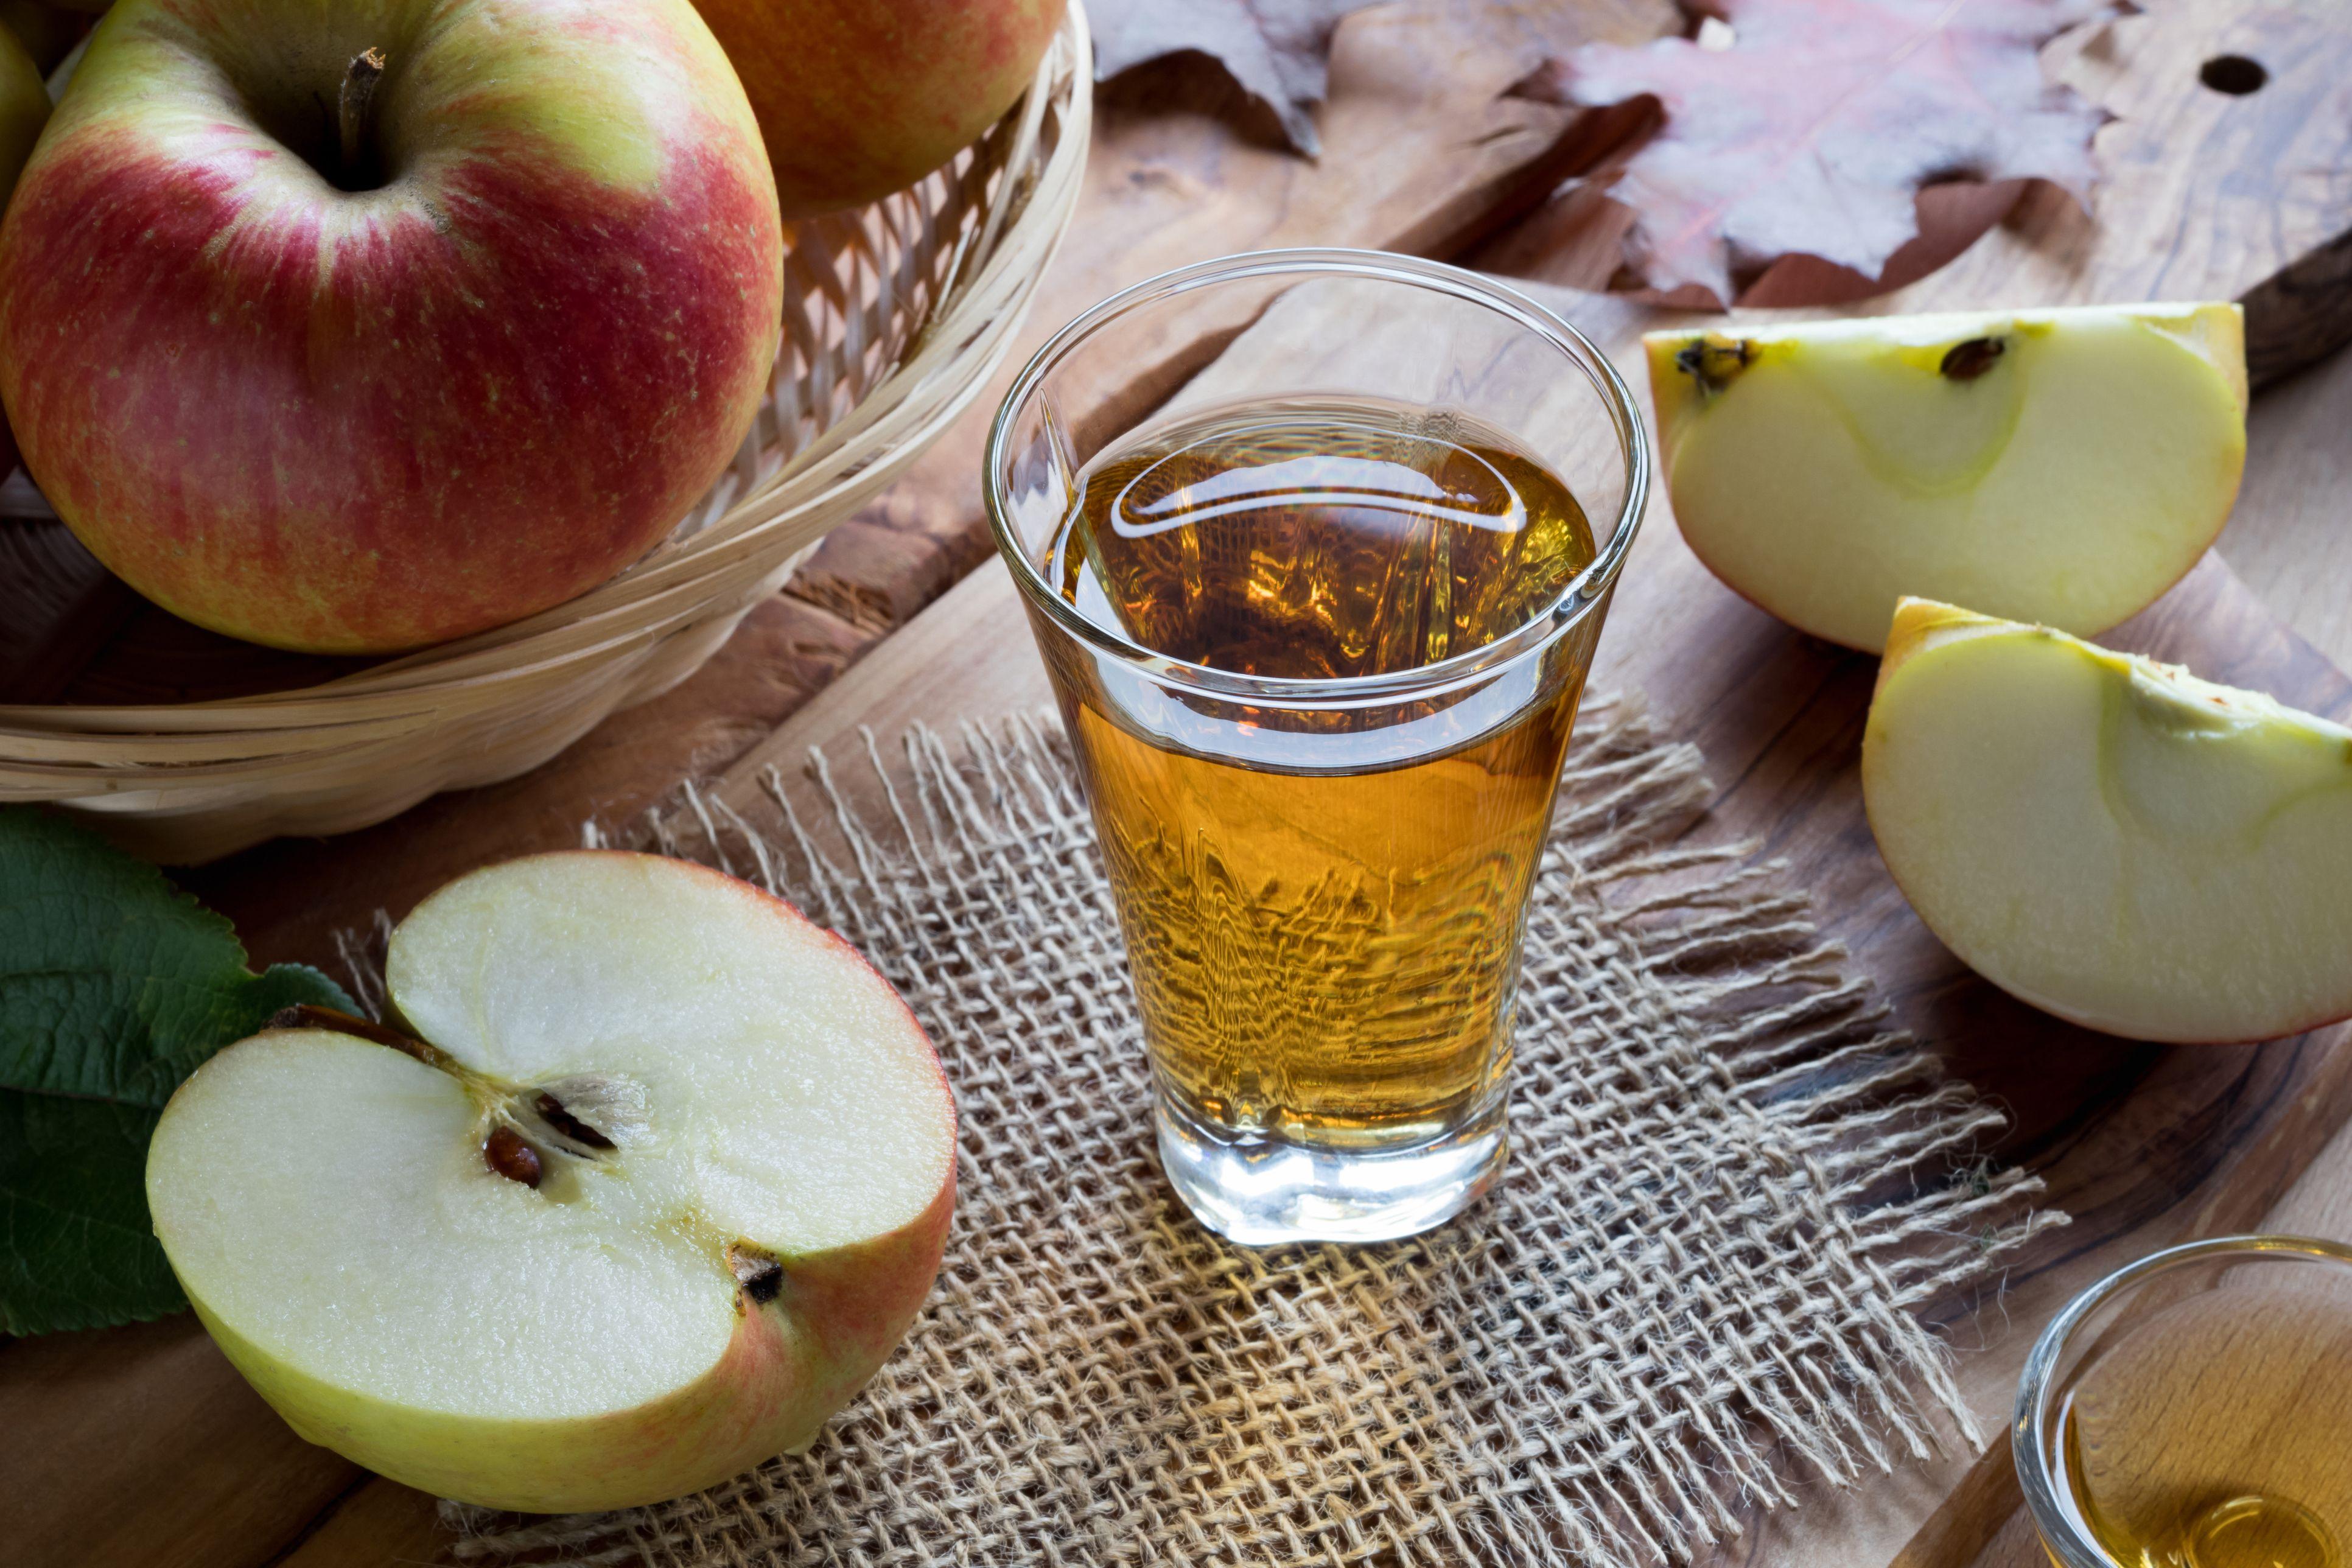 Vinagre como de manzana tomar